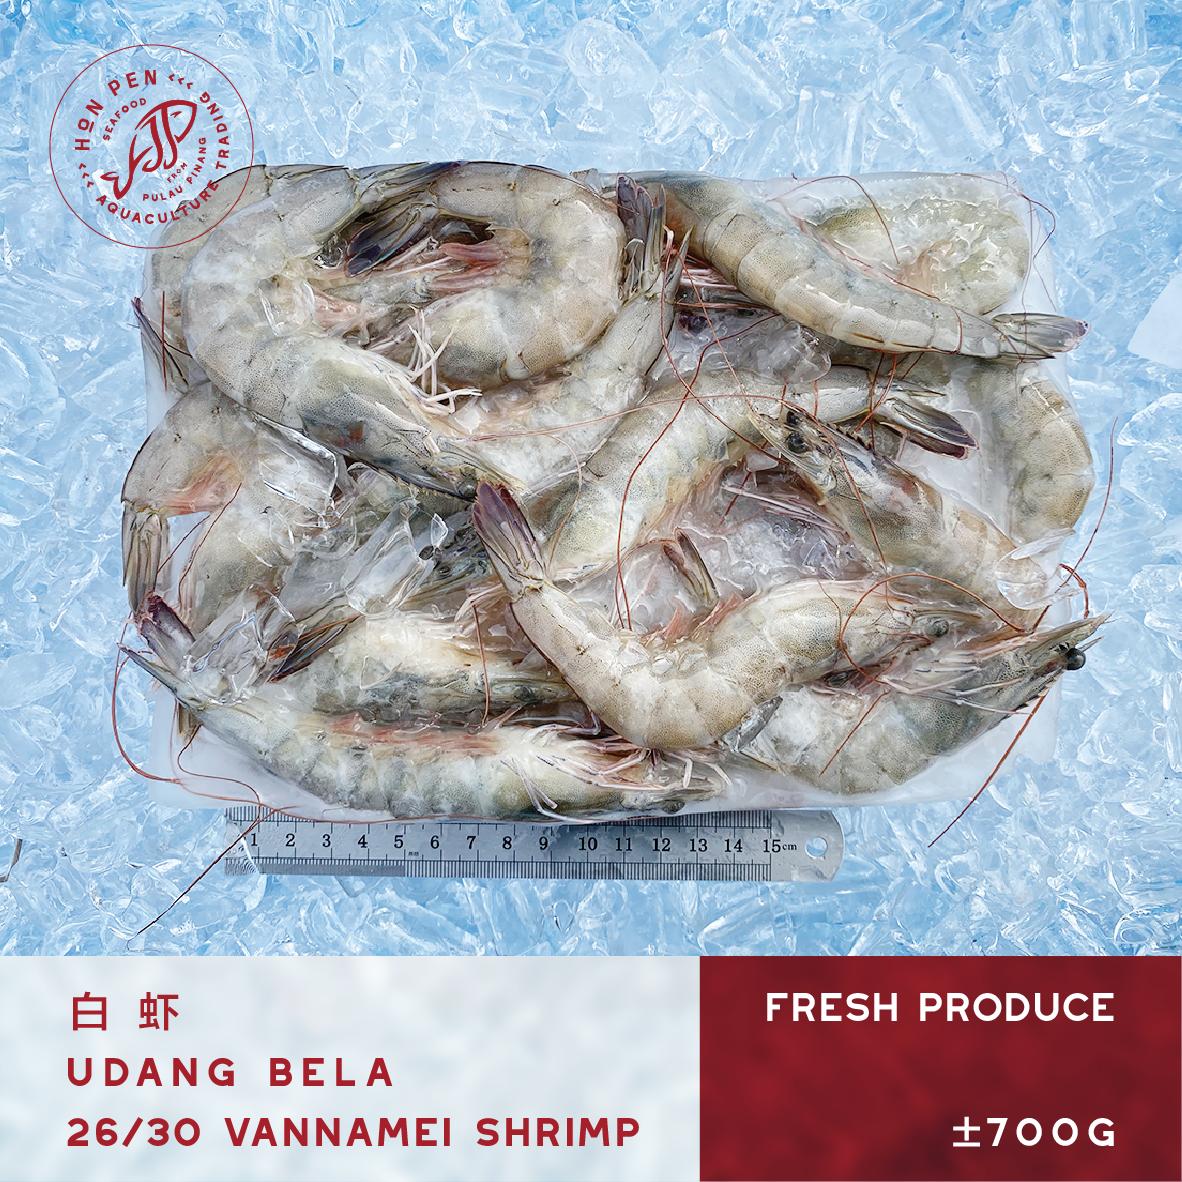 VANNAMEI SHRIMP 26/30 白虾 UDANG BELA (Seafood) ±700g